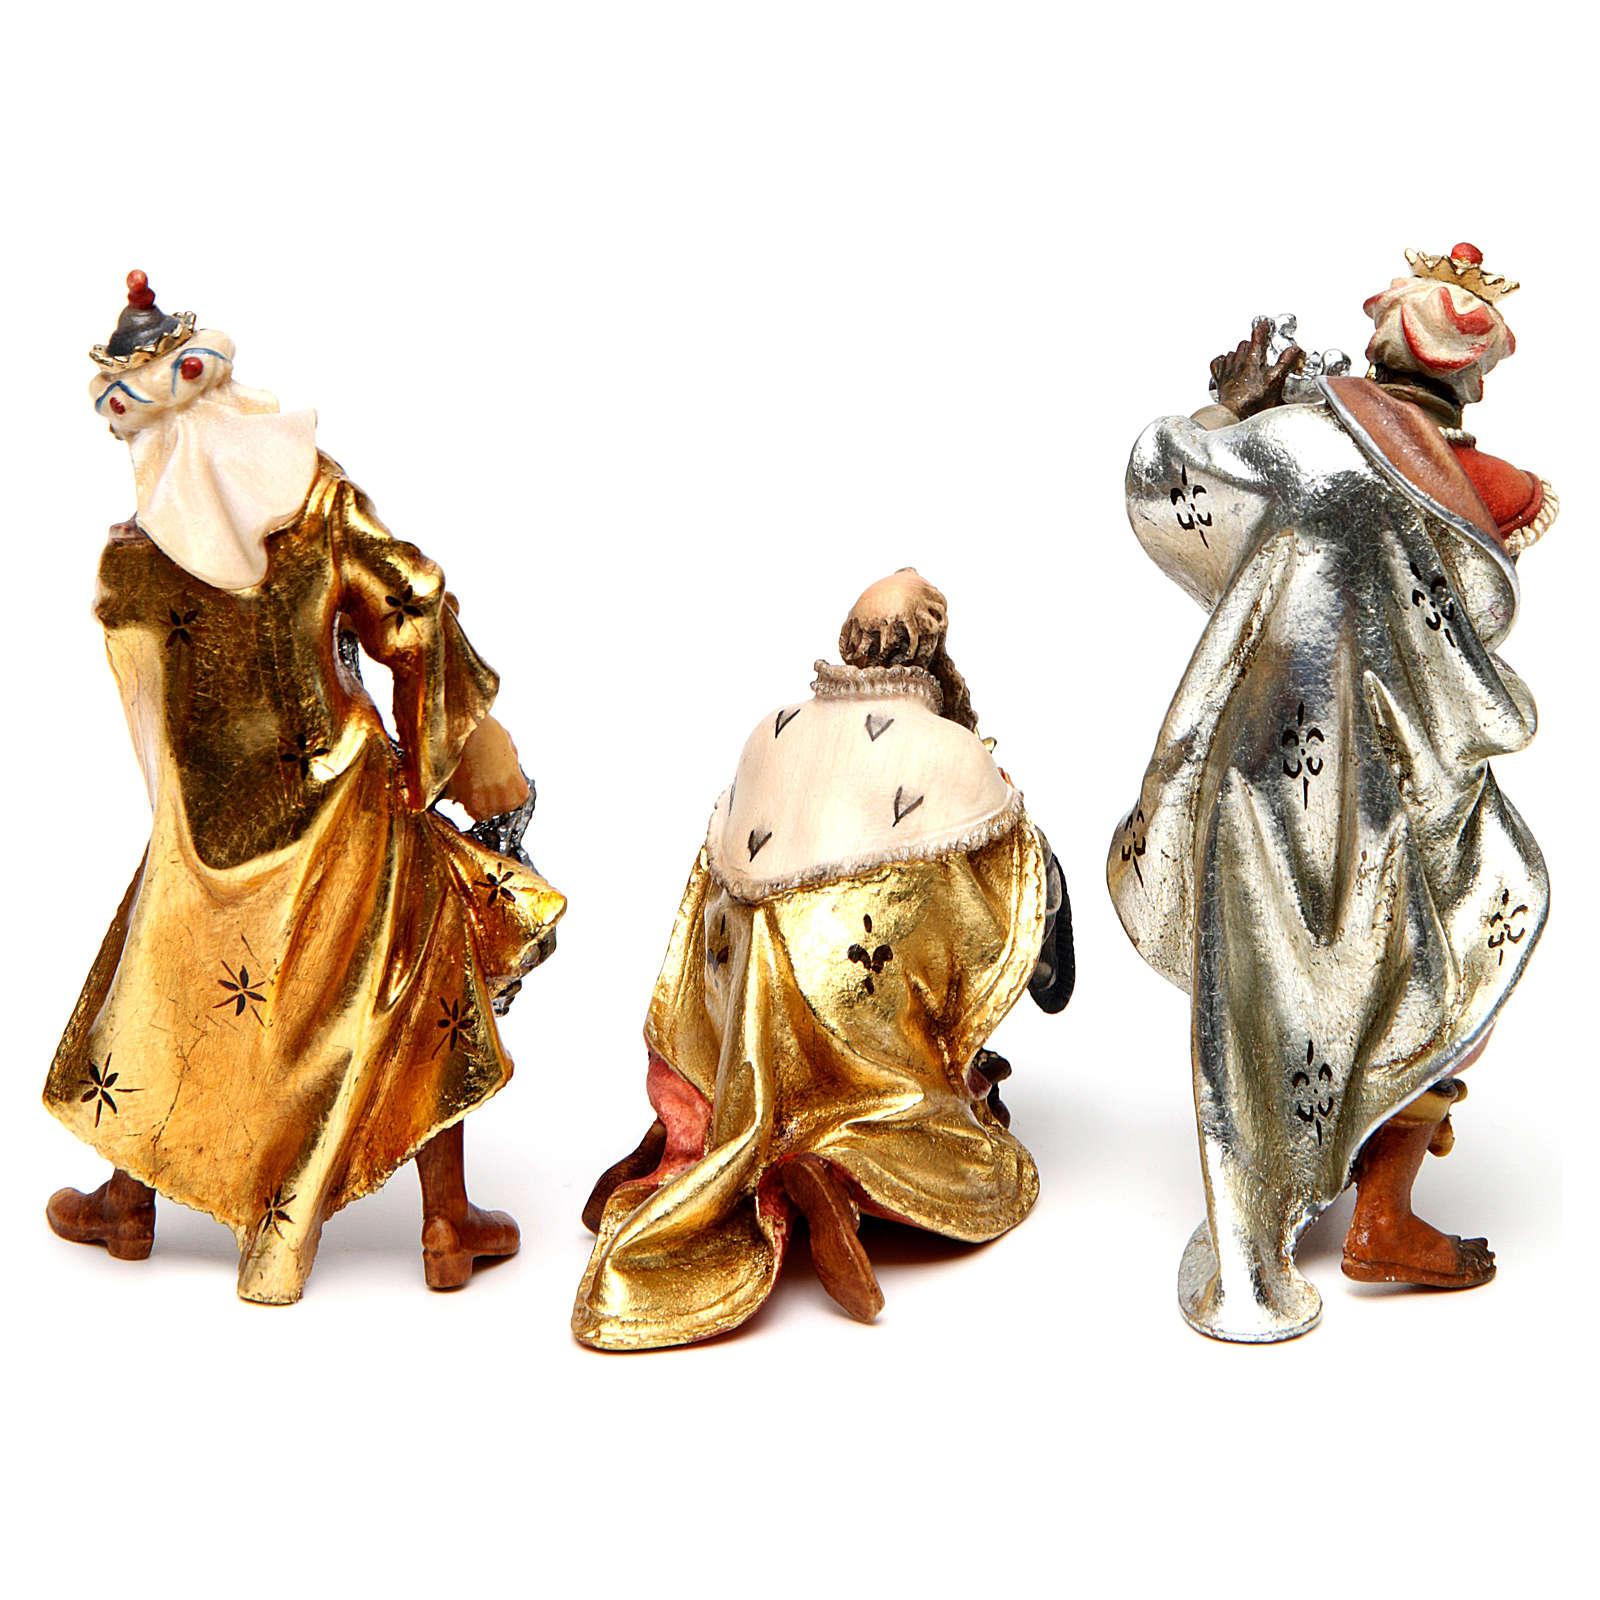 Tre re magi presepe Original legno dipinto in Val Gardena 10 cm 4